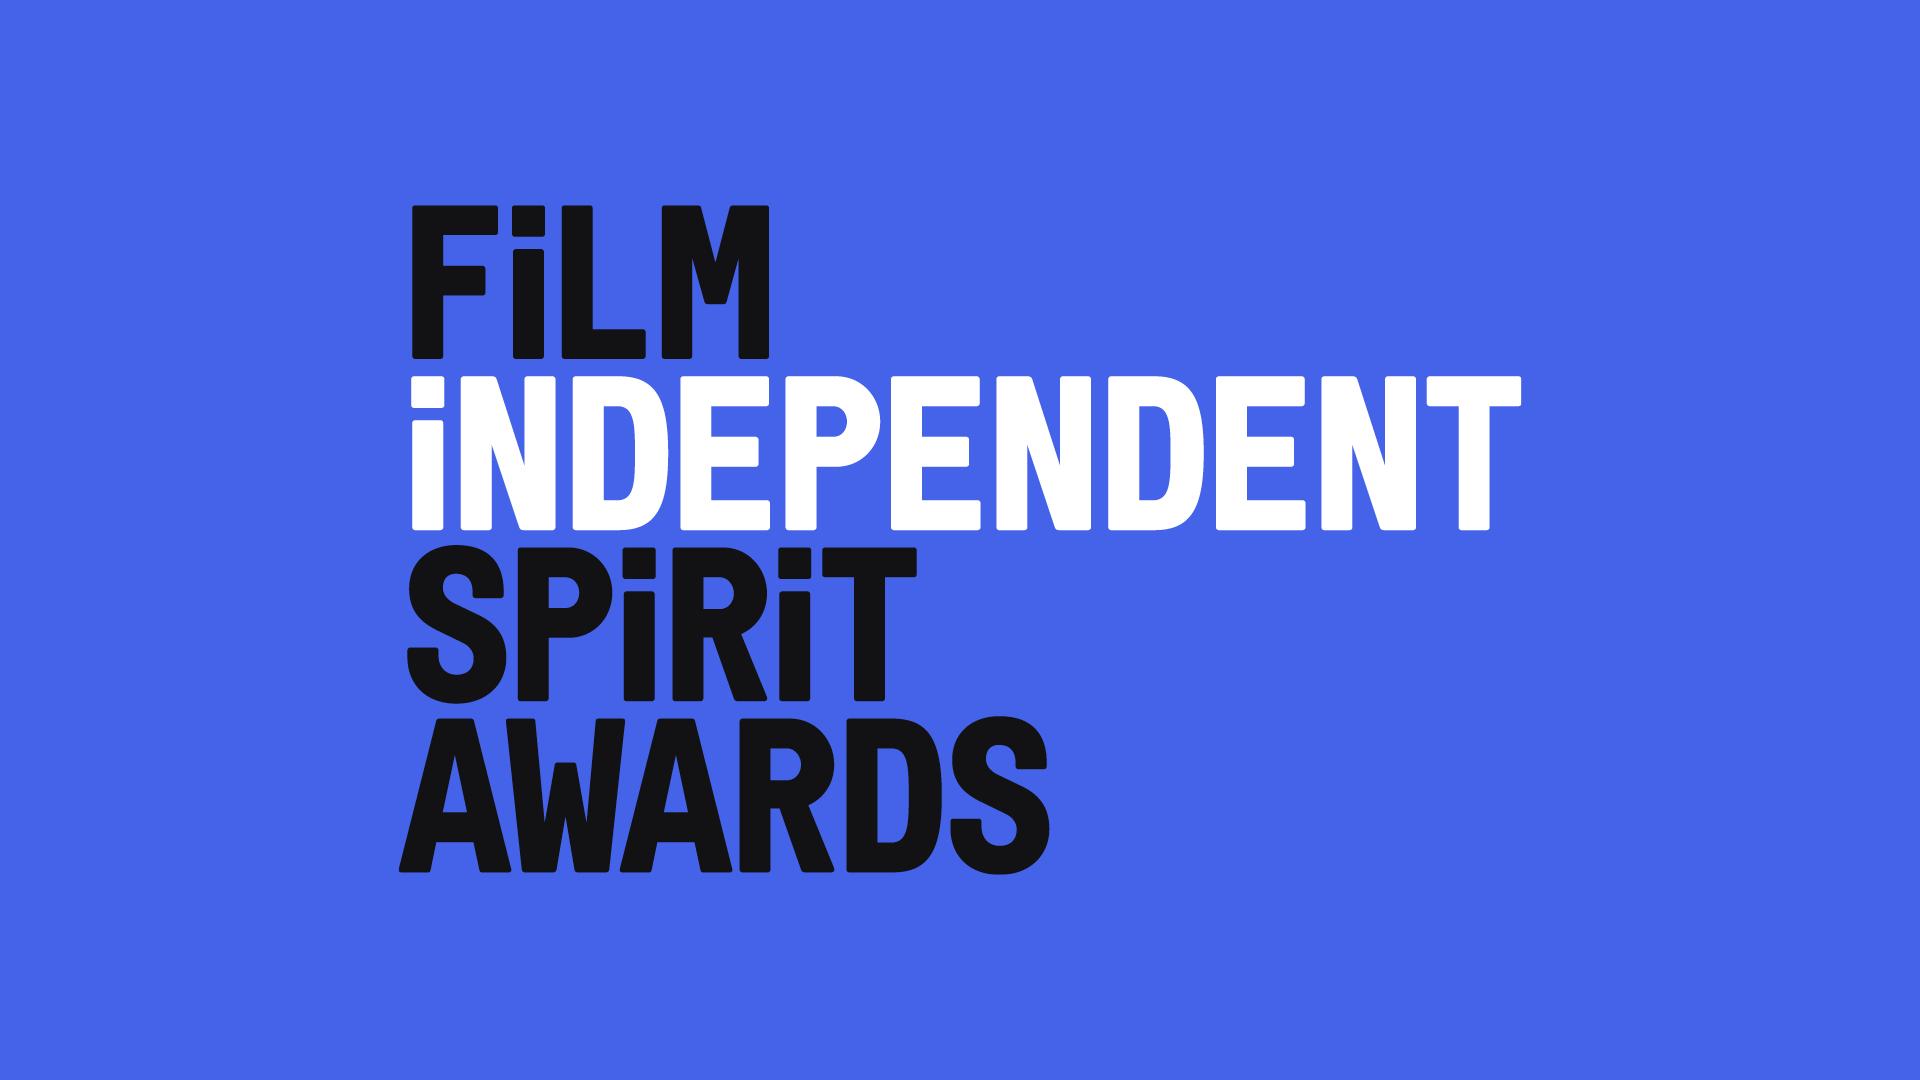 The 2020 Film Independent Spirit Awards